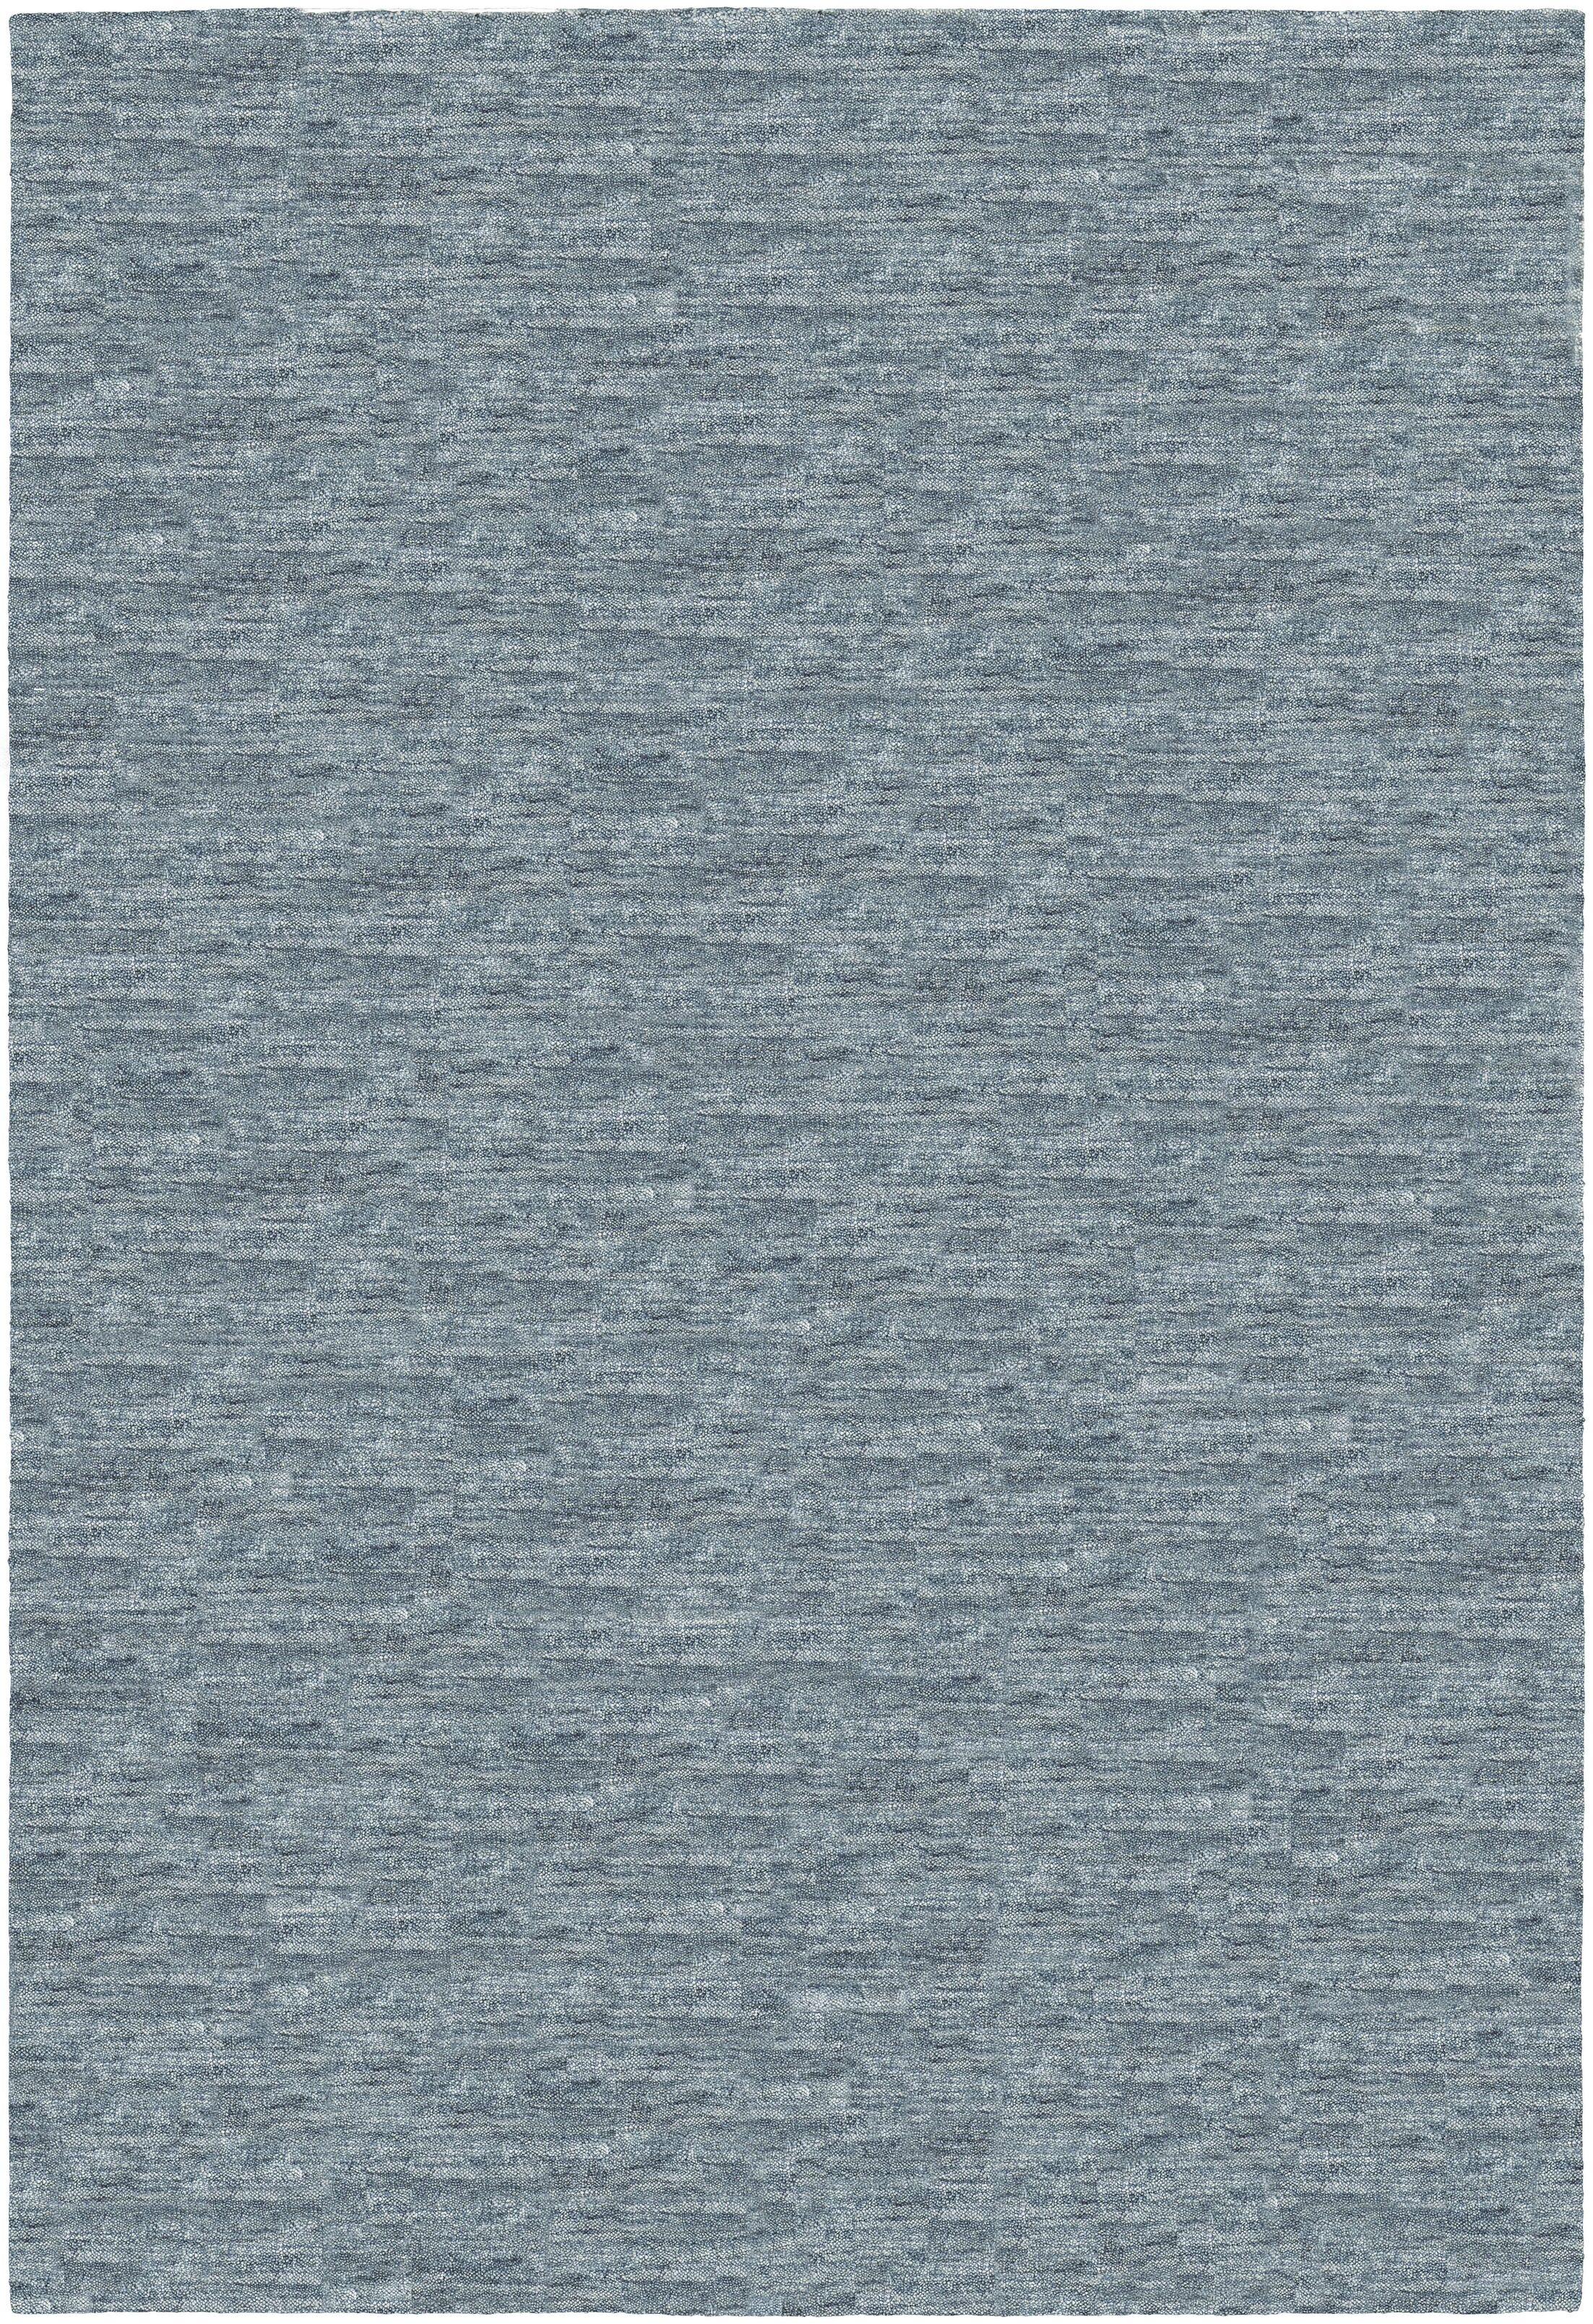 Bayside Hand-Woven Charcoal Area Rug Rug Size: Rectangle 7'10